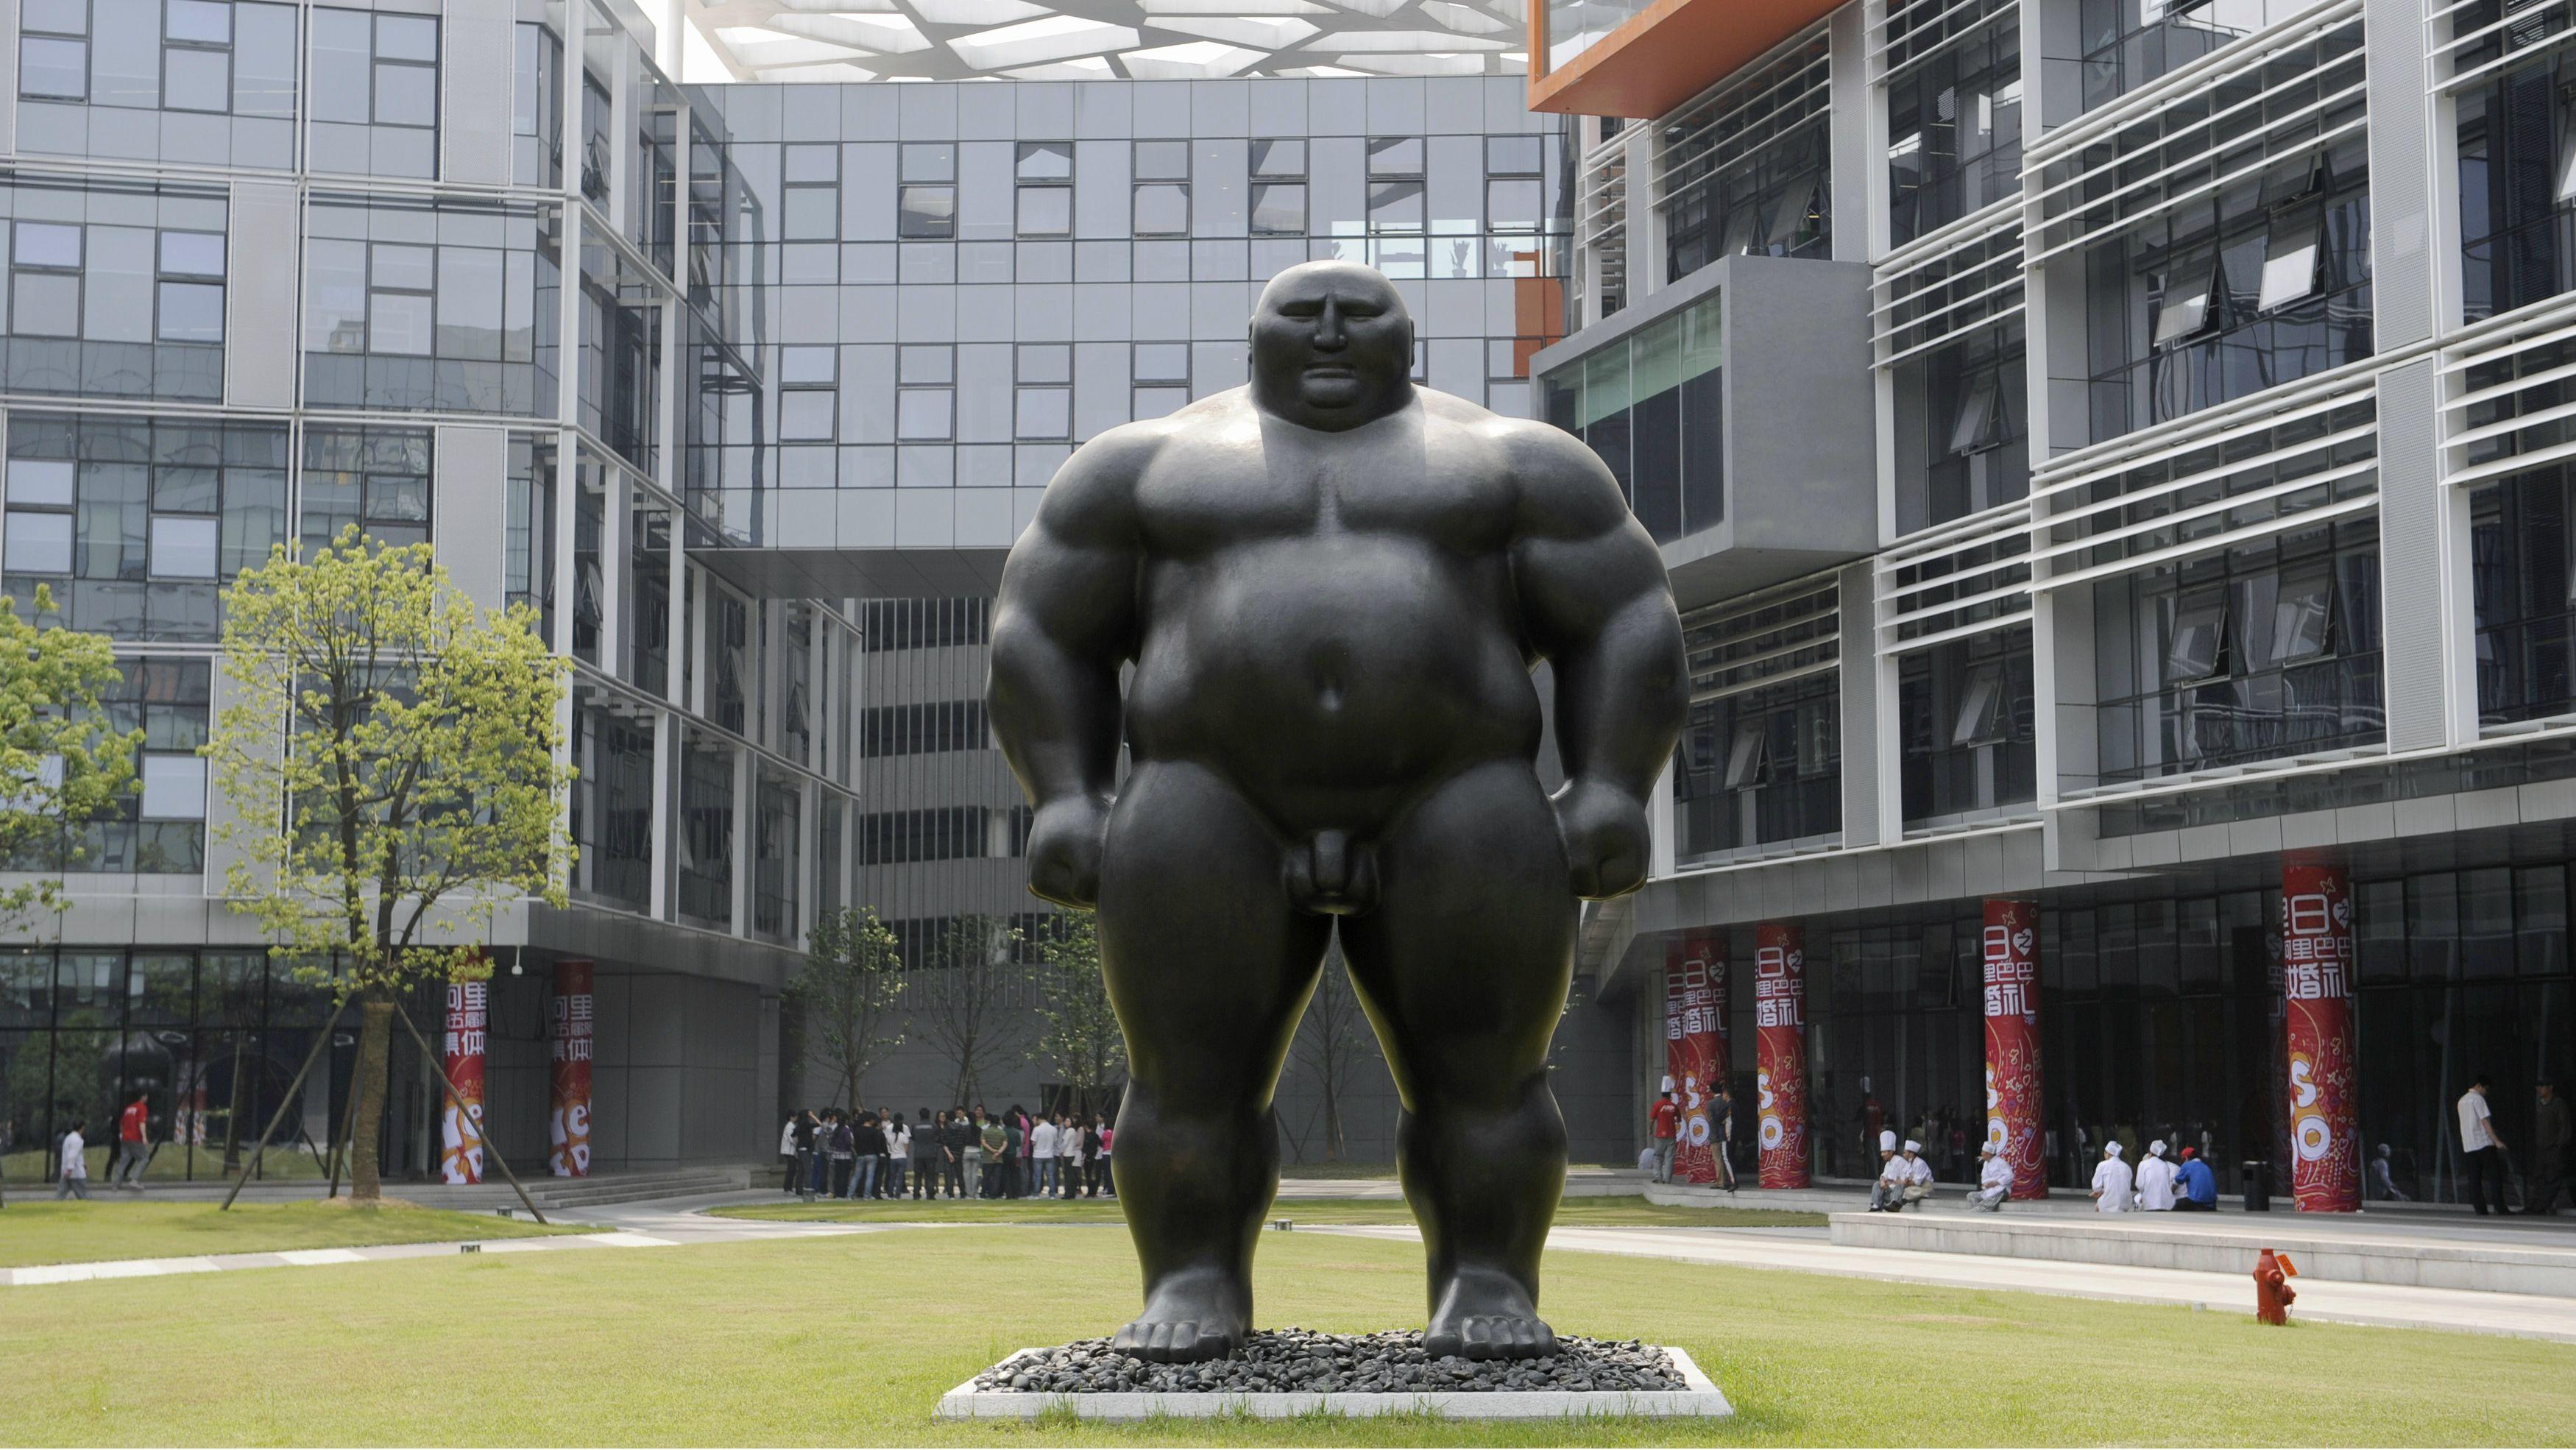 Giant status at Alibaba headquarters